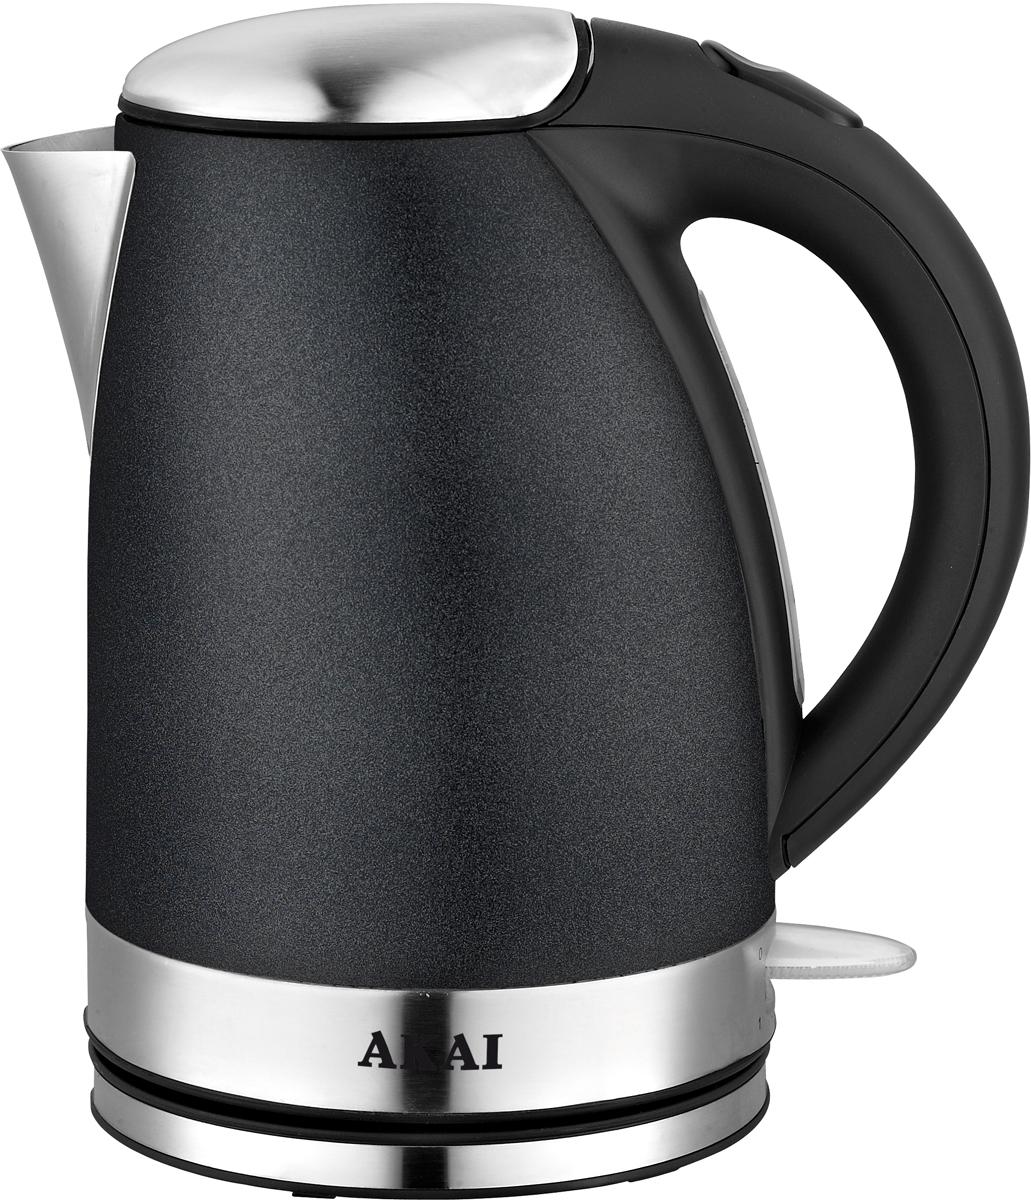 Akai 1014В, Black электрический чайник akai 1020х silver электрический чайник